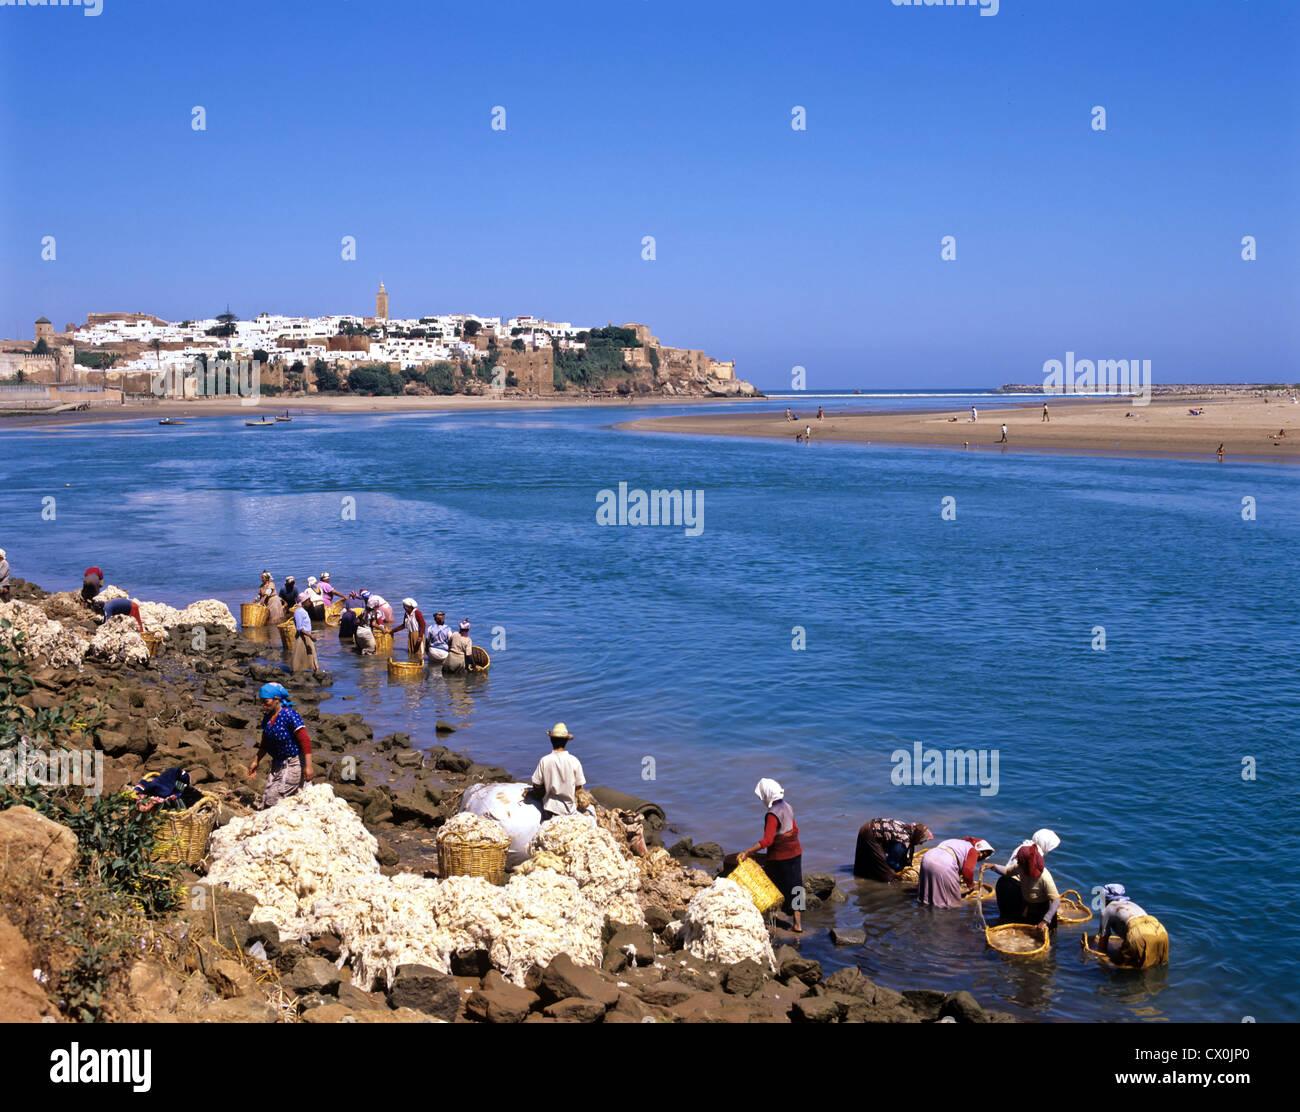 8140. Women washing wool in R Bouregreg, Rabat, Morocco - Stock Image